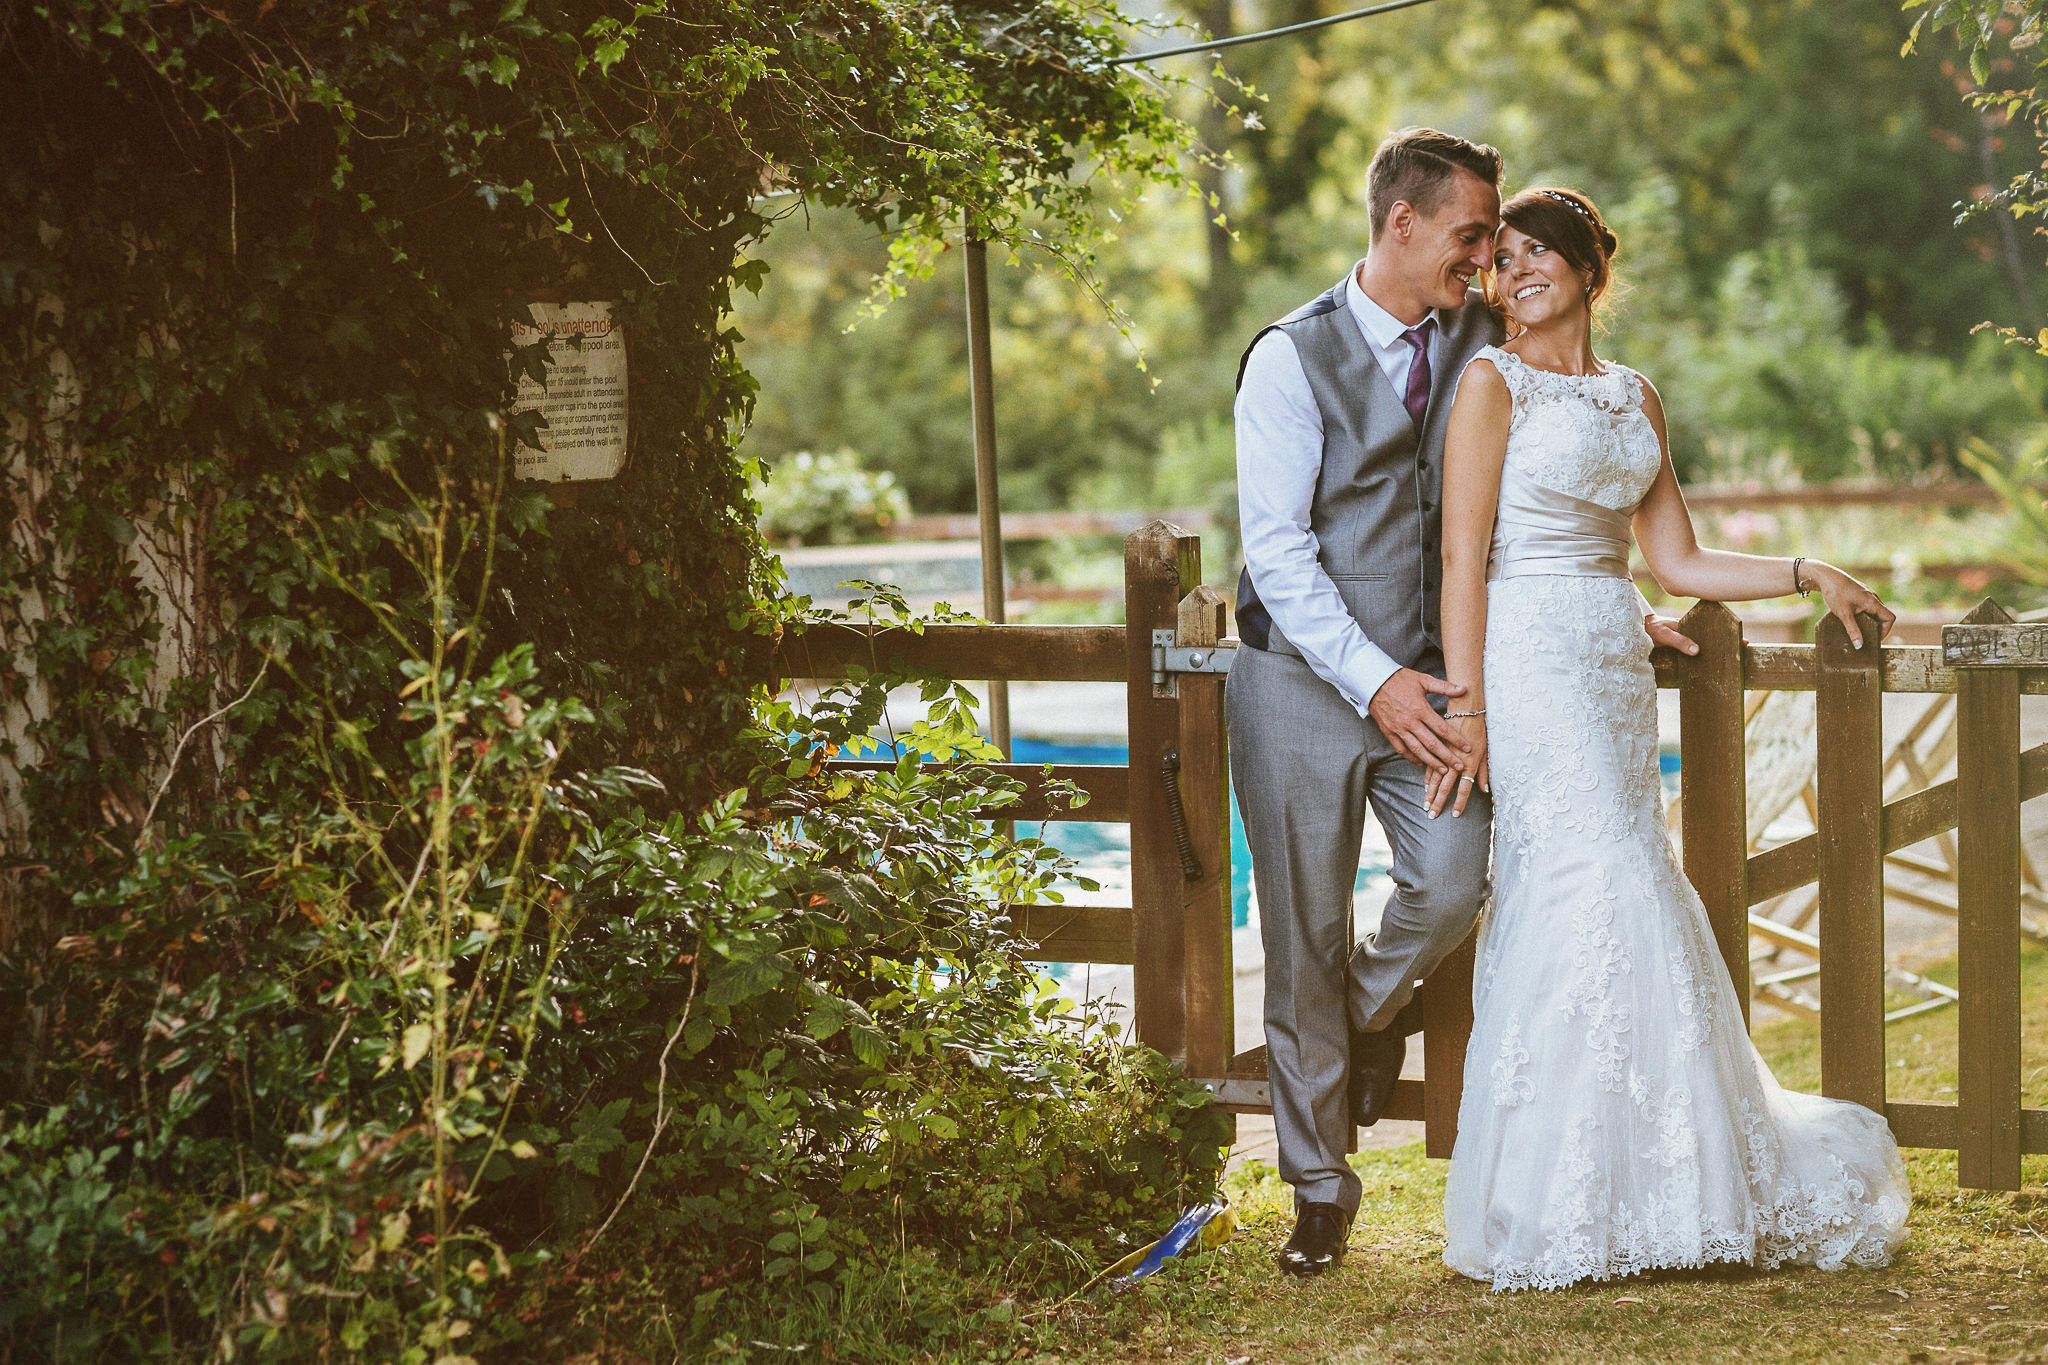 paul-marbrook-Caer-Llan-Wedding-Photographer-90089